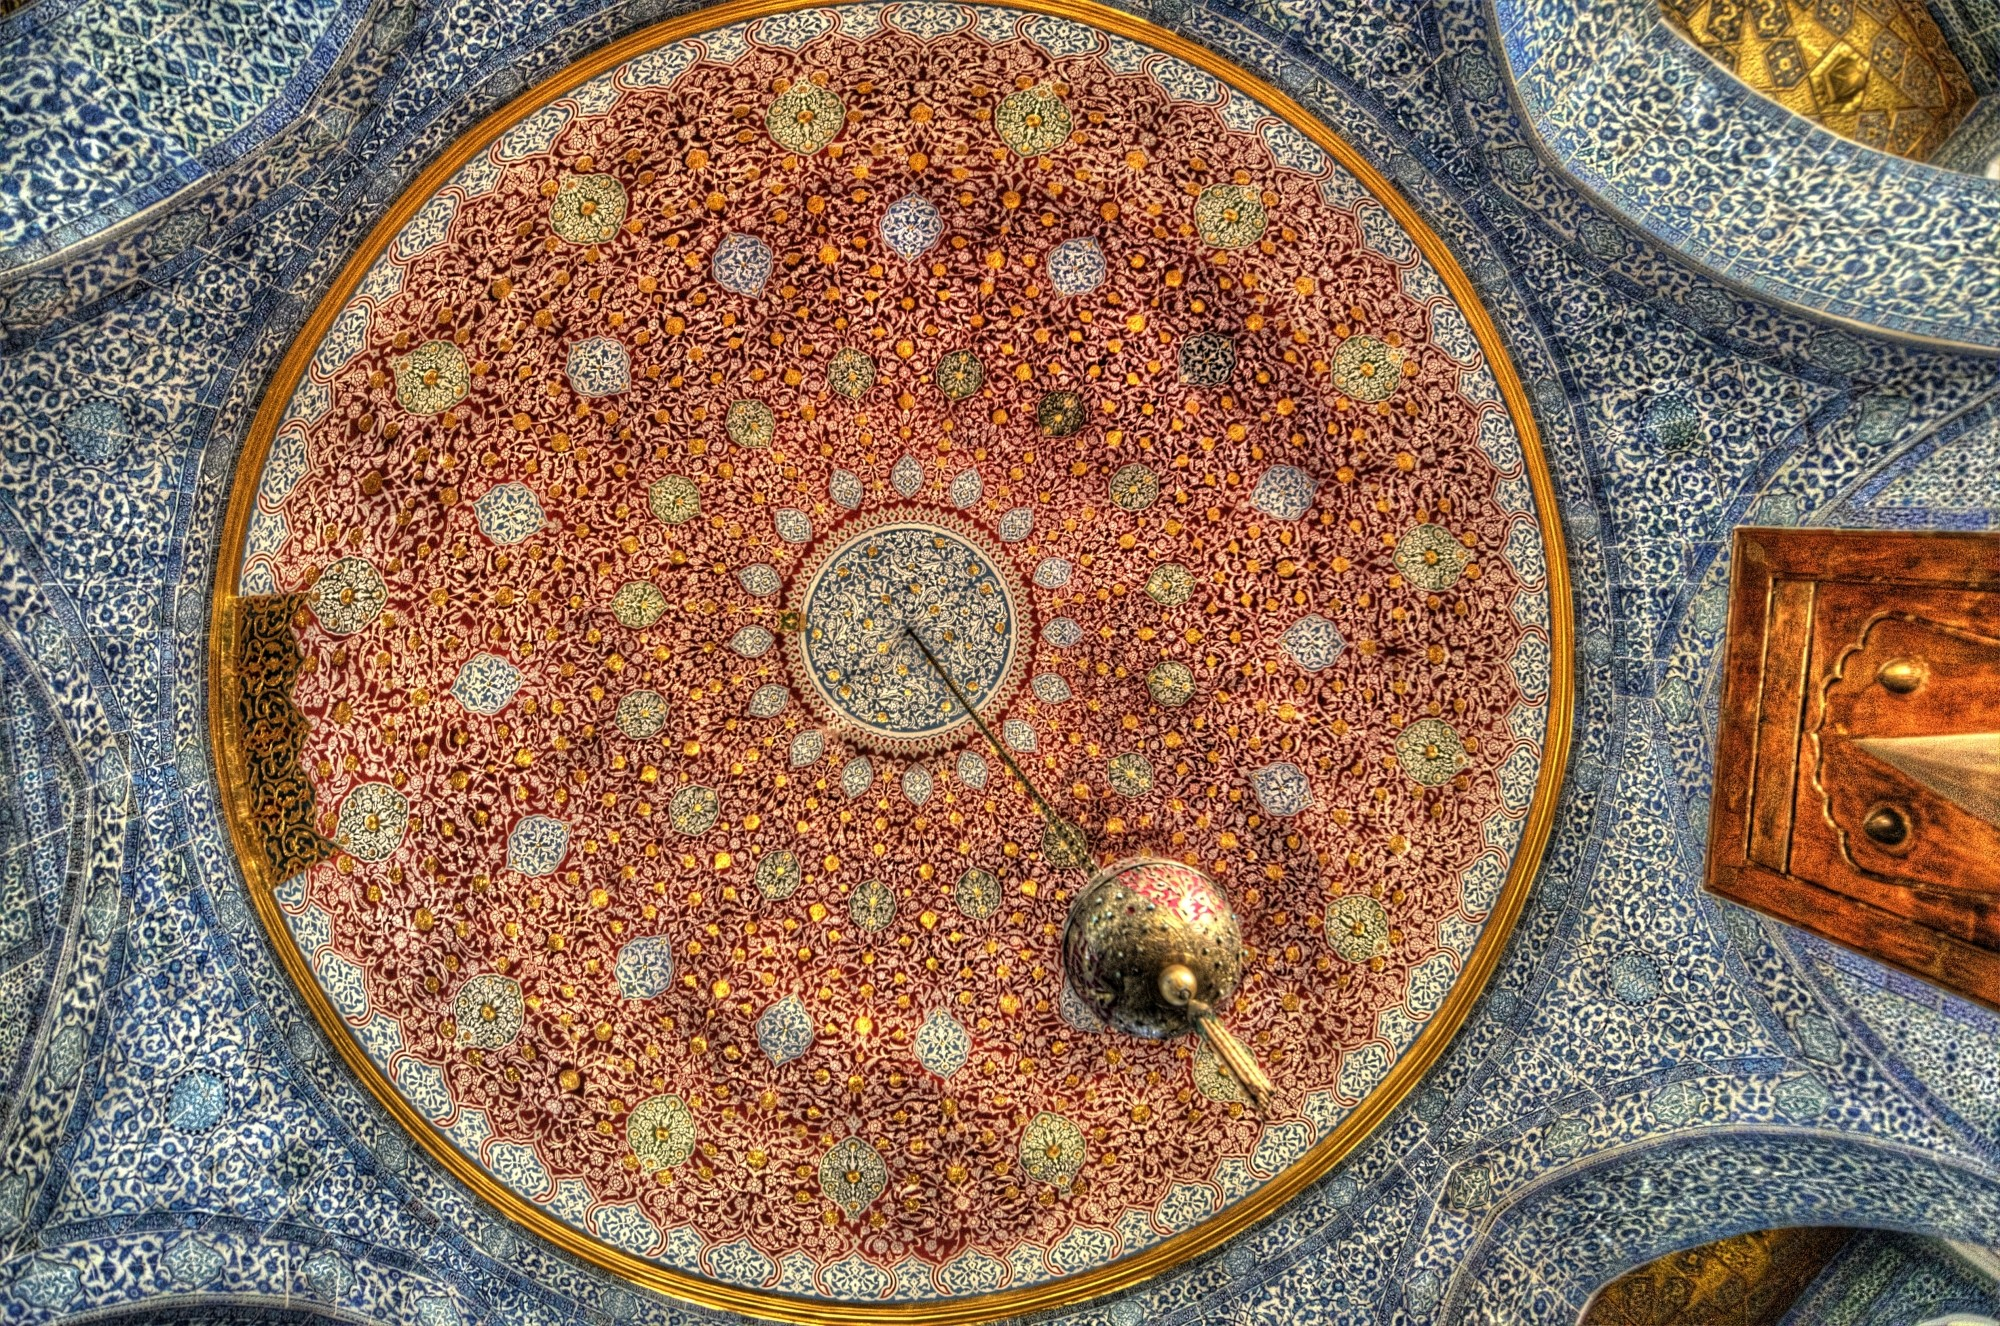 Topkapı Palace in Istanbul